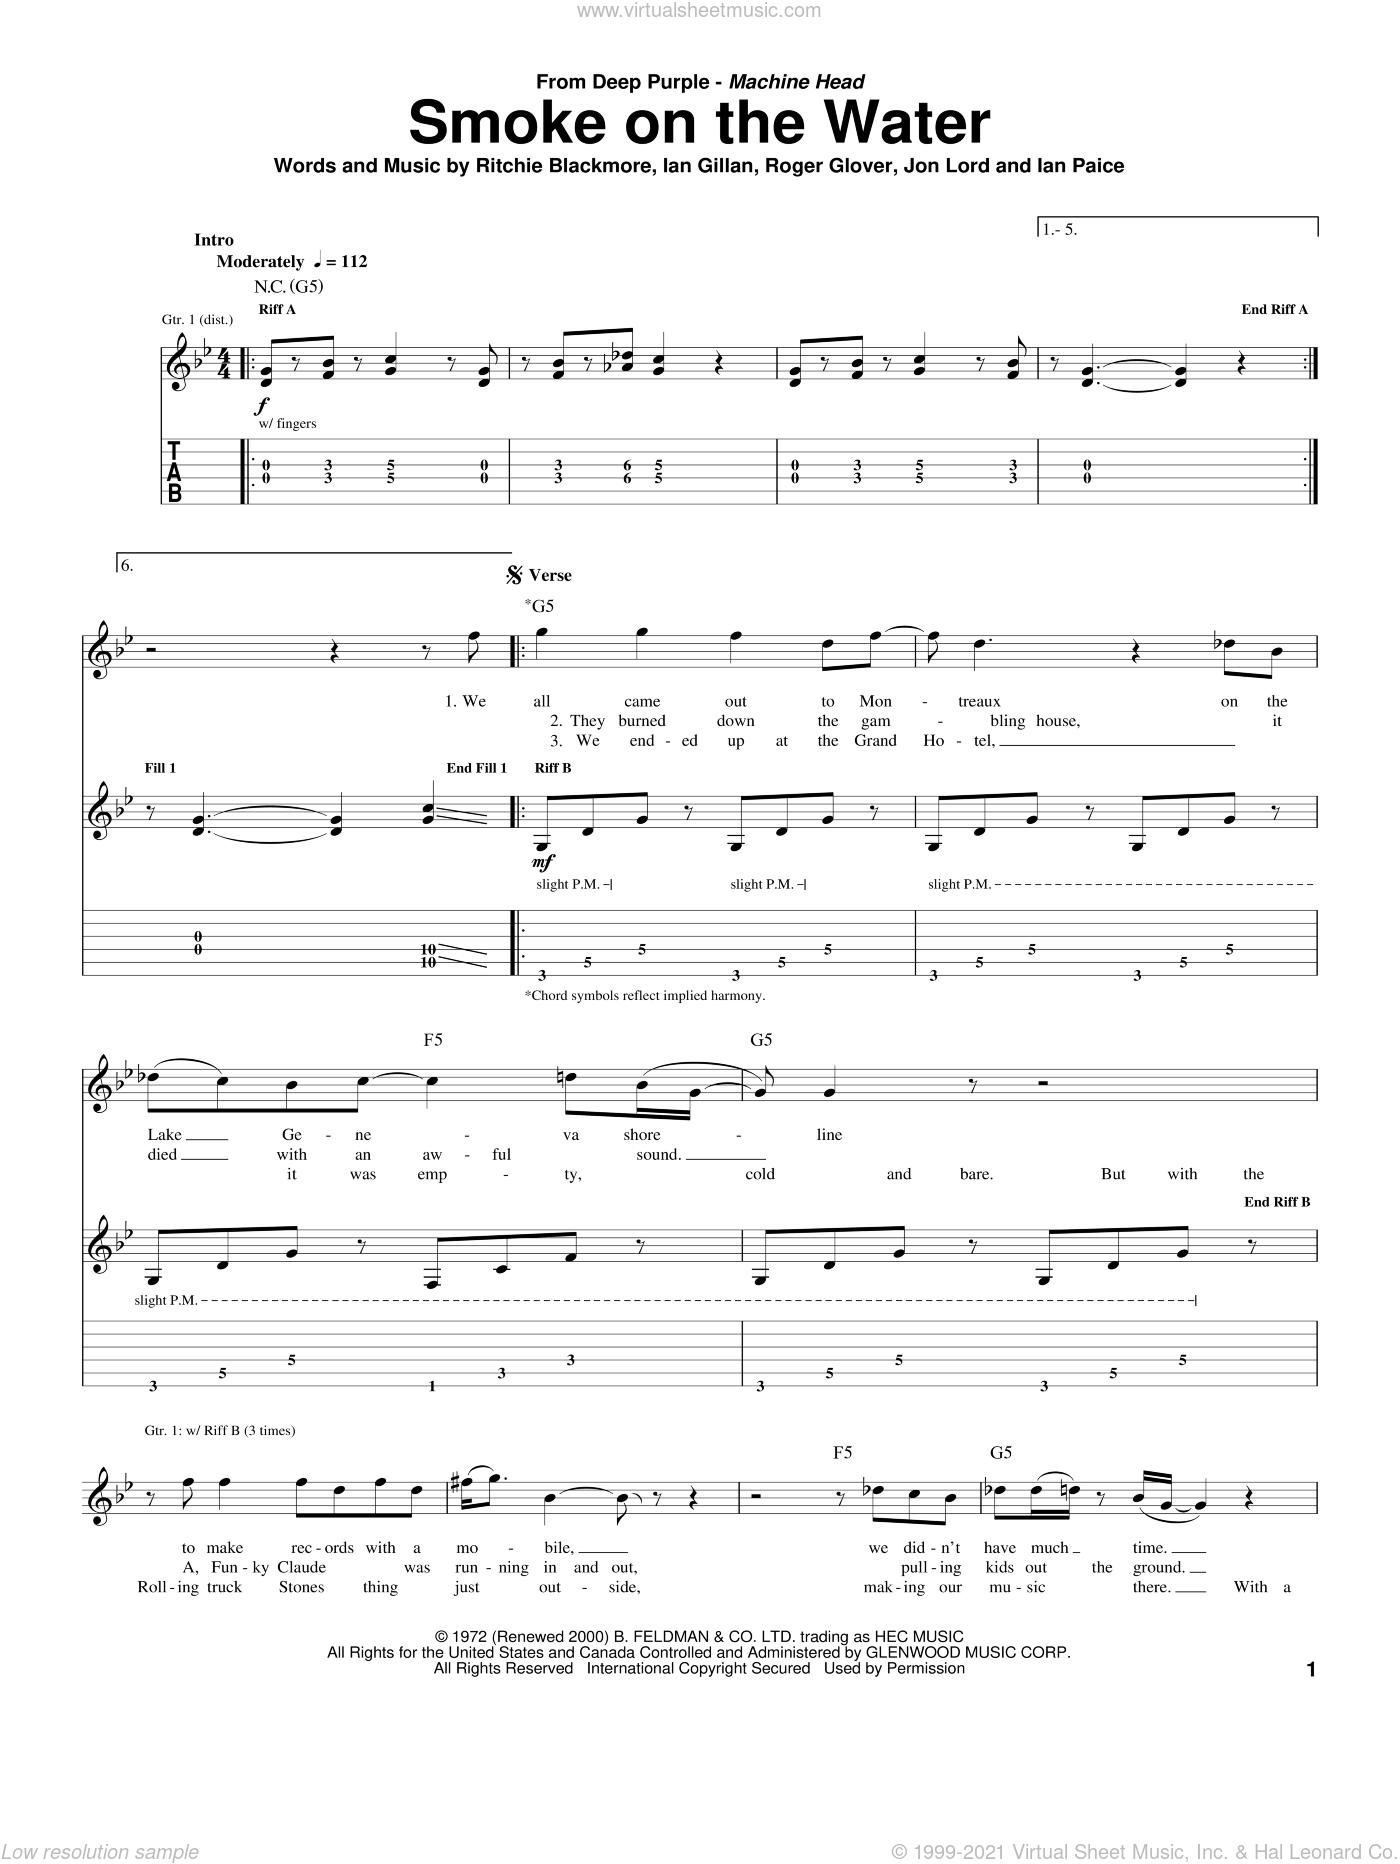 Smoke On The Water sheet music for guitar (tablature) by Deep Purple, Ian Gillan, Ian Paice, Jon Lord, Ritchie Blackmore and Roger Glover, intermediate skill level